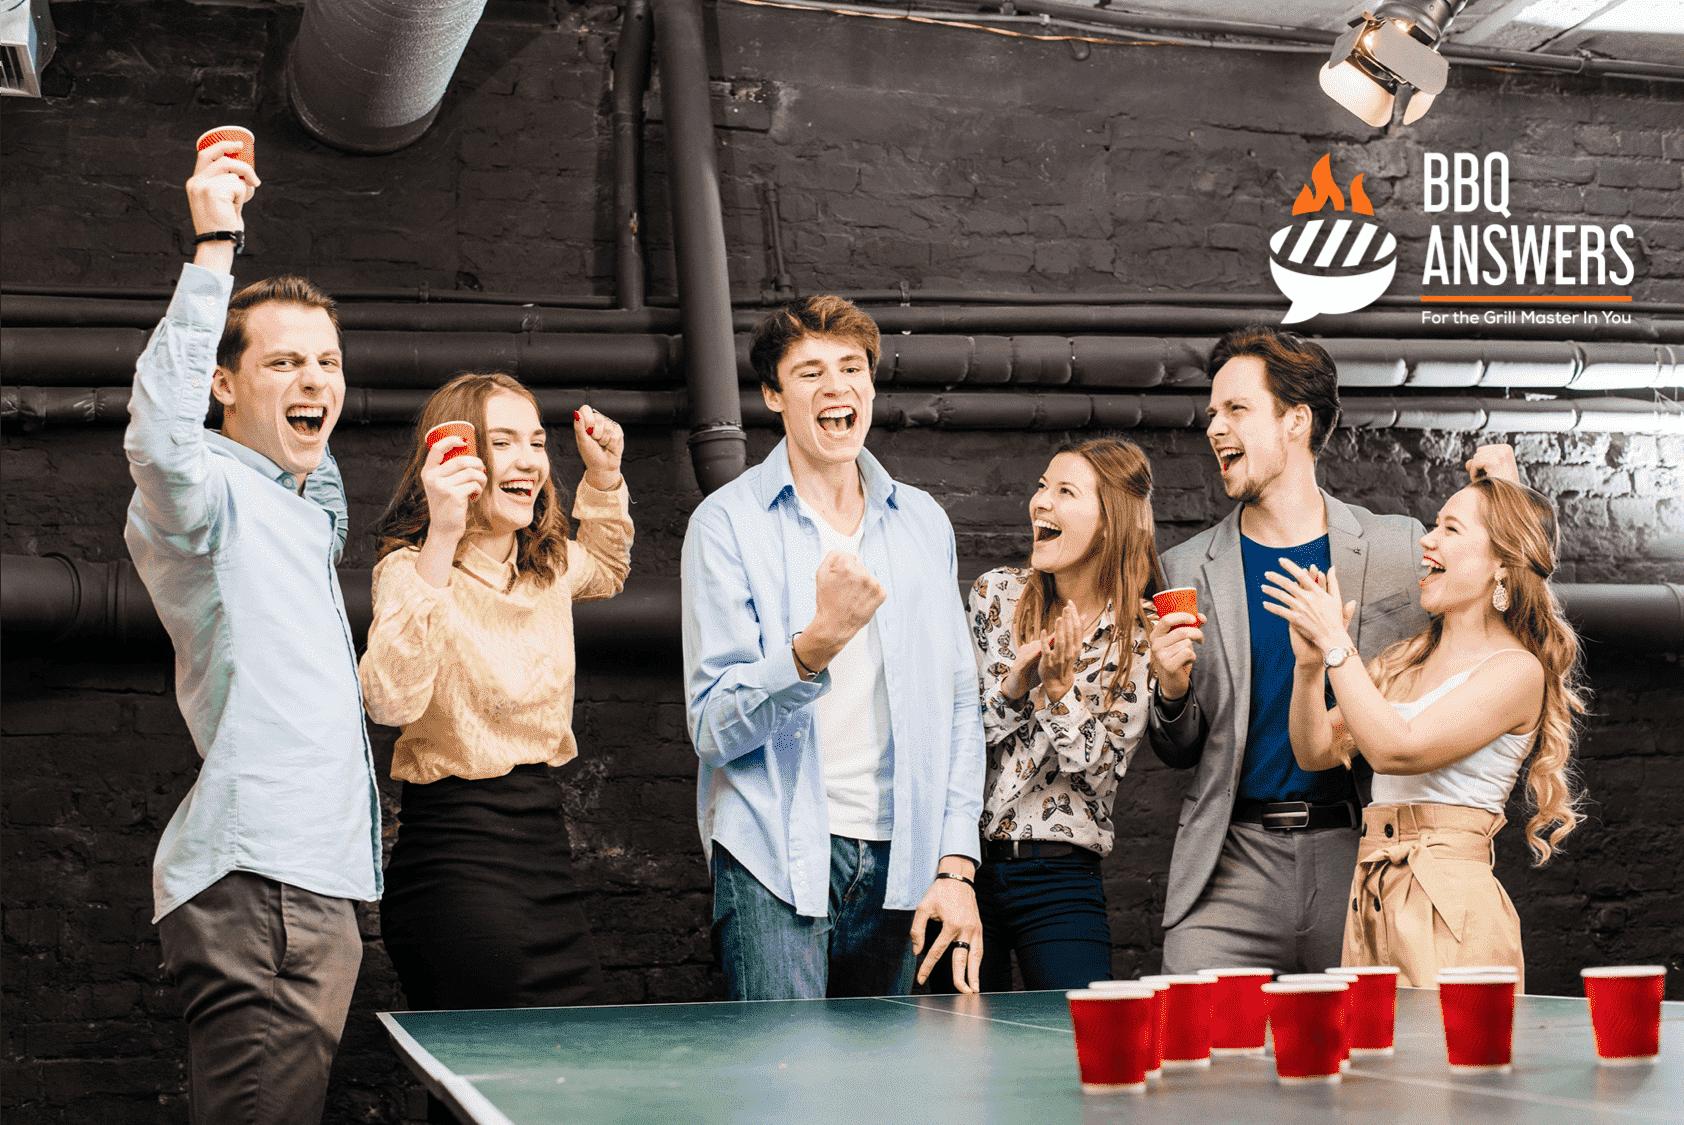 Beer Pong | Games at Tailgating Parties | BBQanswers